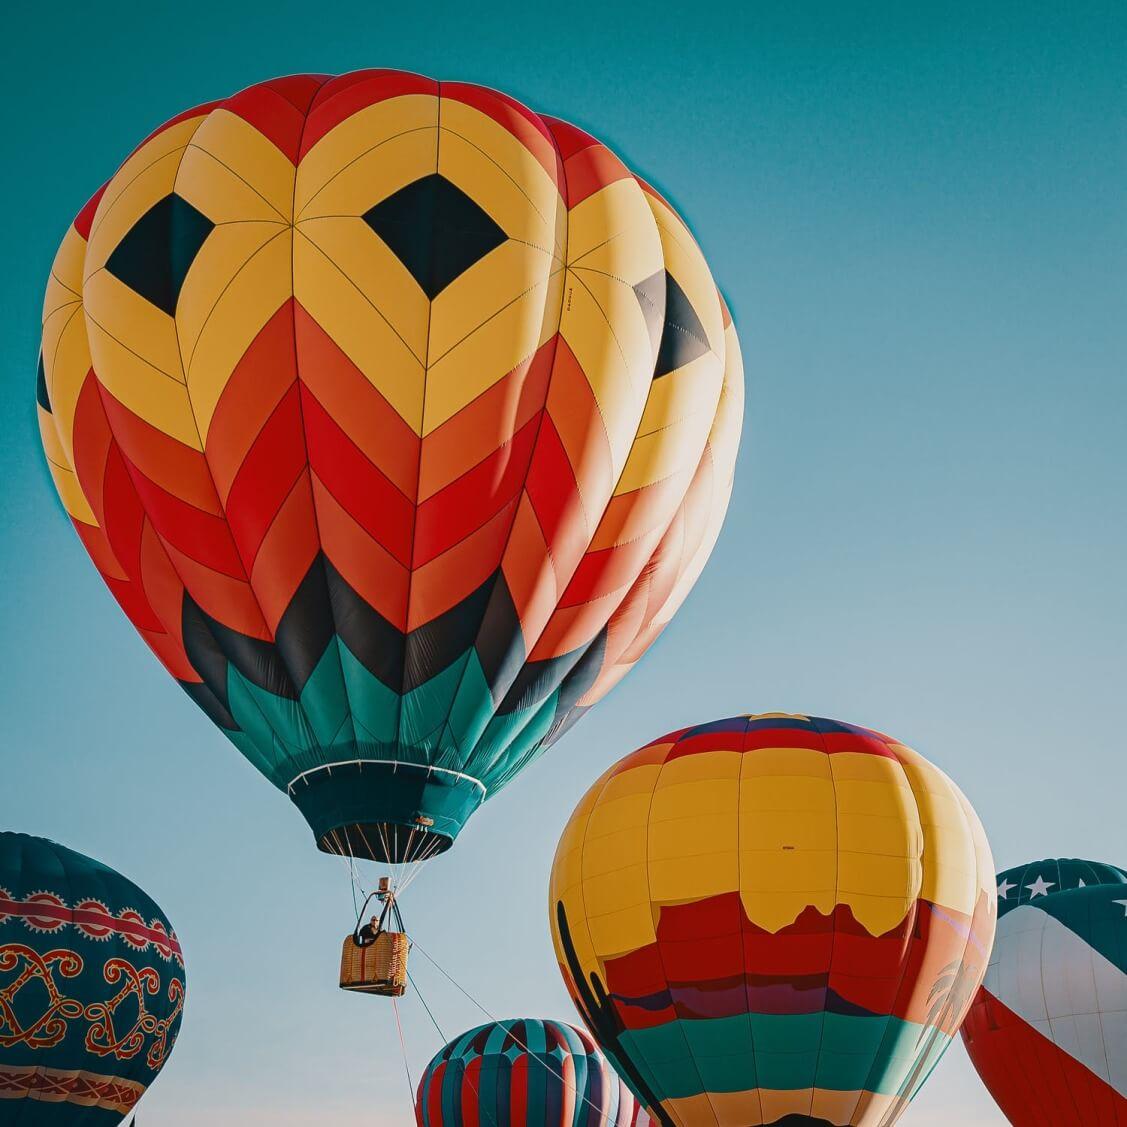 Hot Air Balloon - Original image